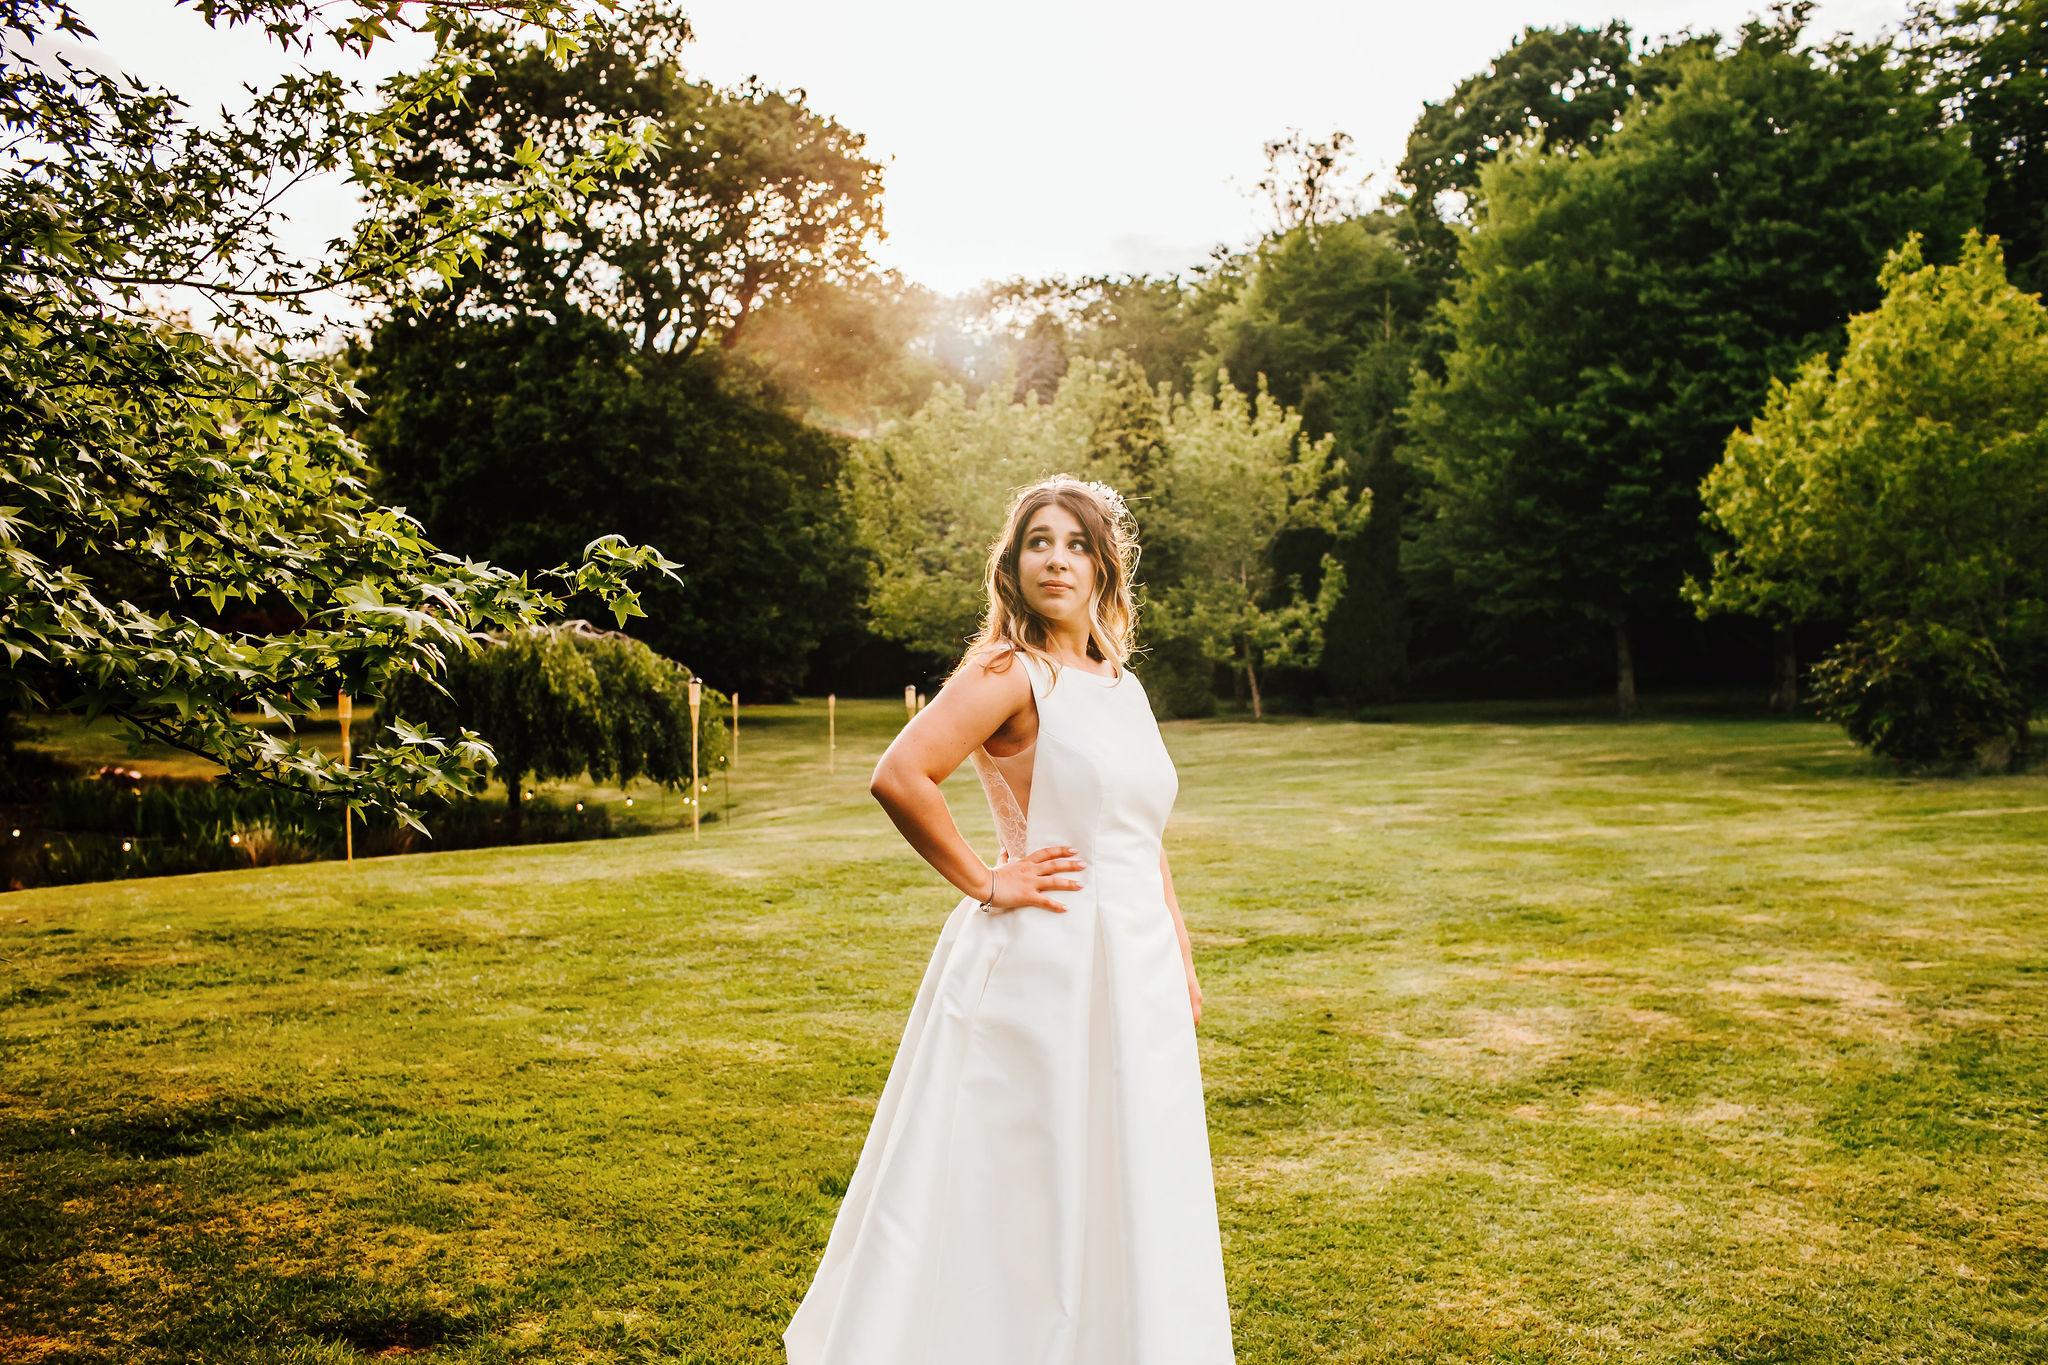 fiesta-fields-louisa-thomas-blog-bride-2-abigailwhite.jpg